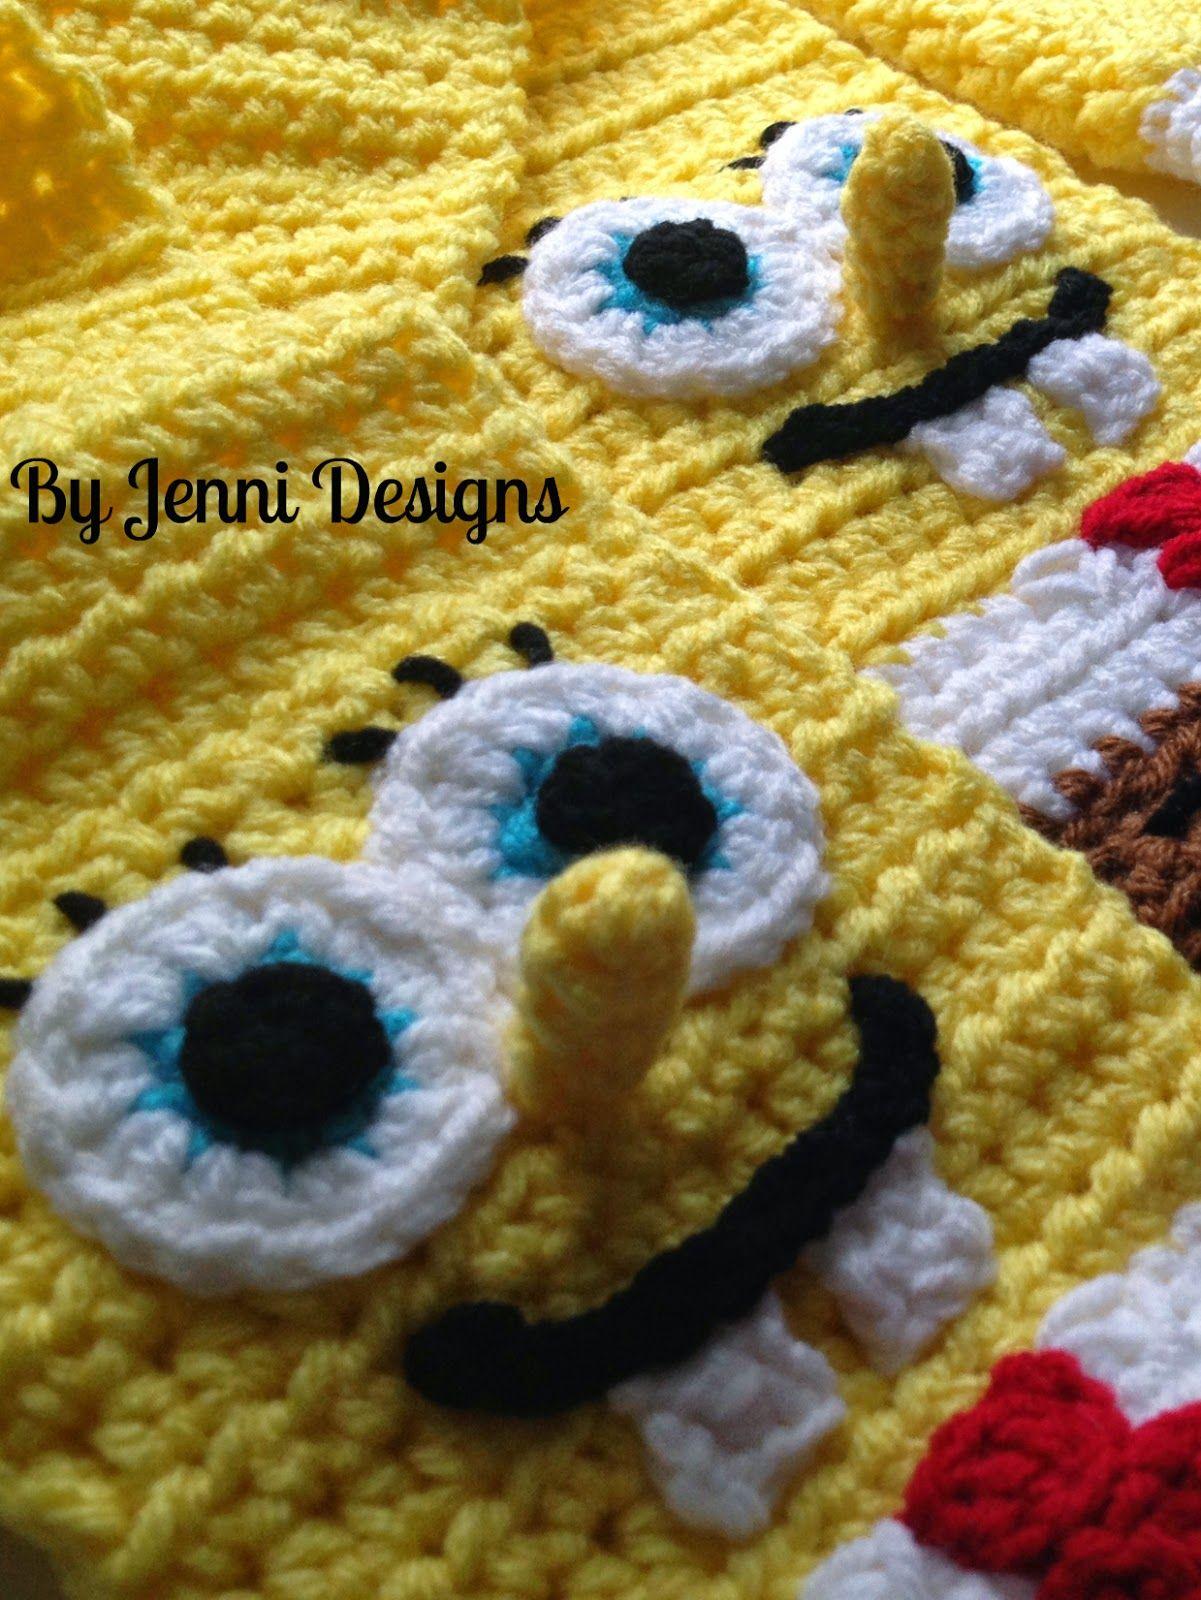 By Jenni Designs: Spongebob Squarepants Inspired Scarf Pattern ...